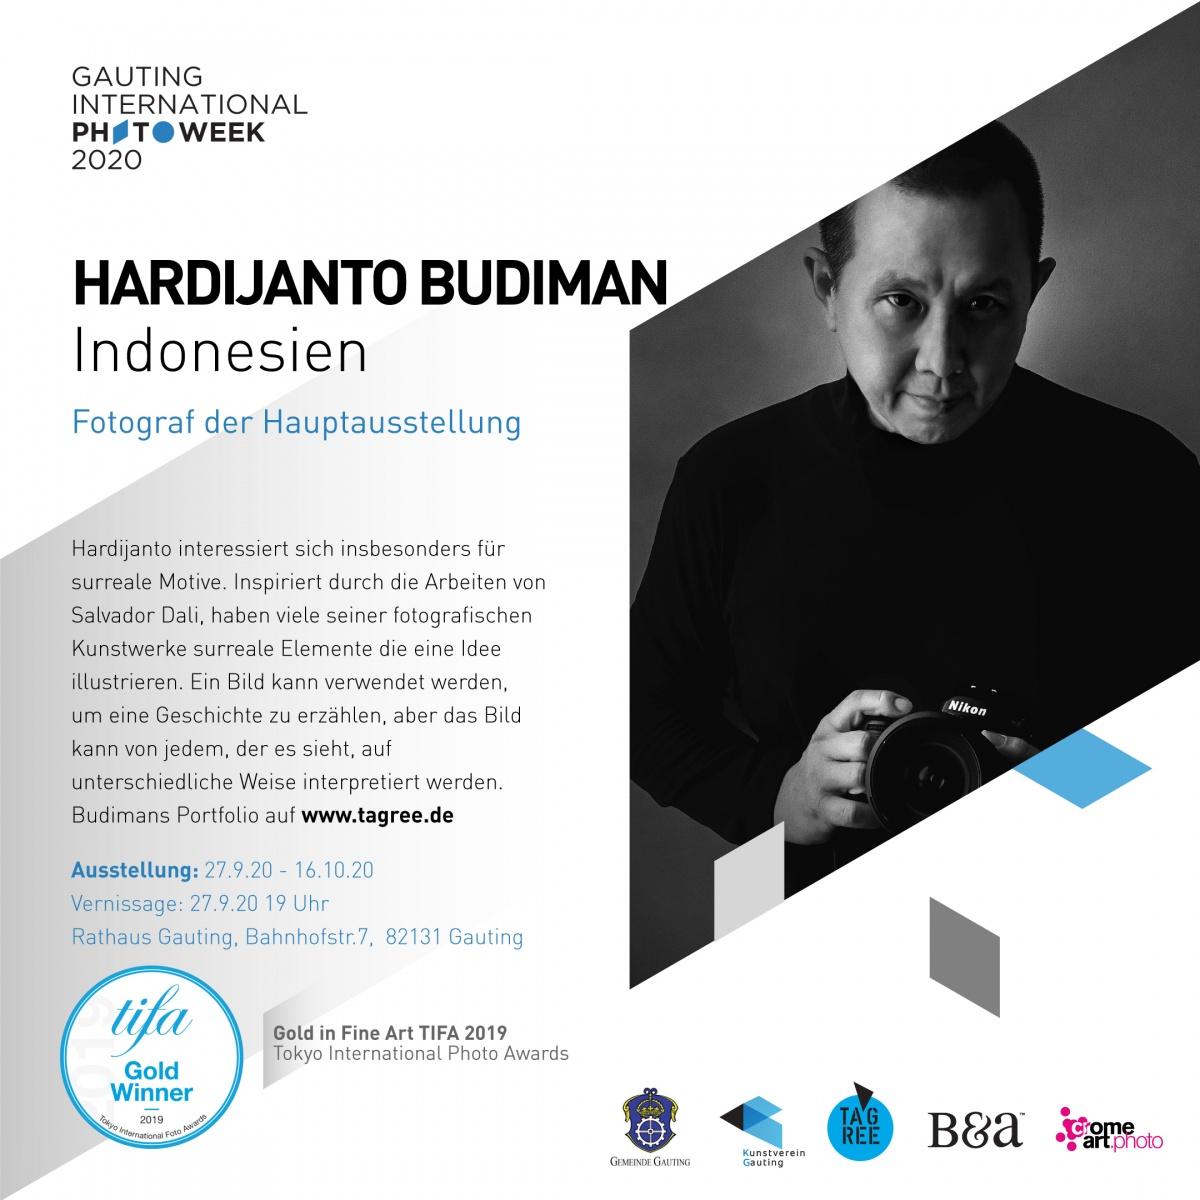 Hardijanto Budiman / Indonesien